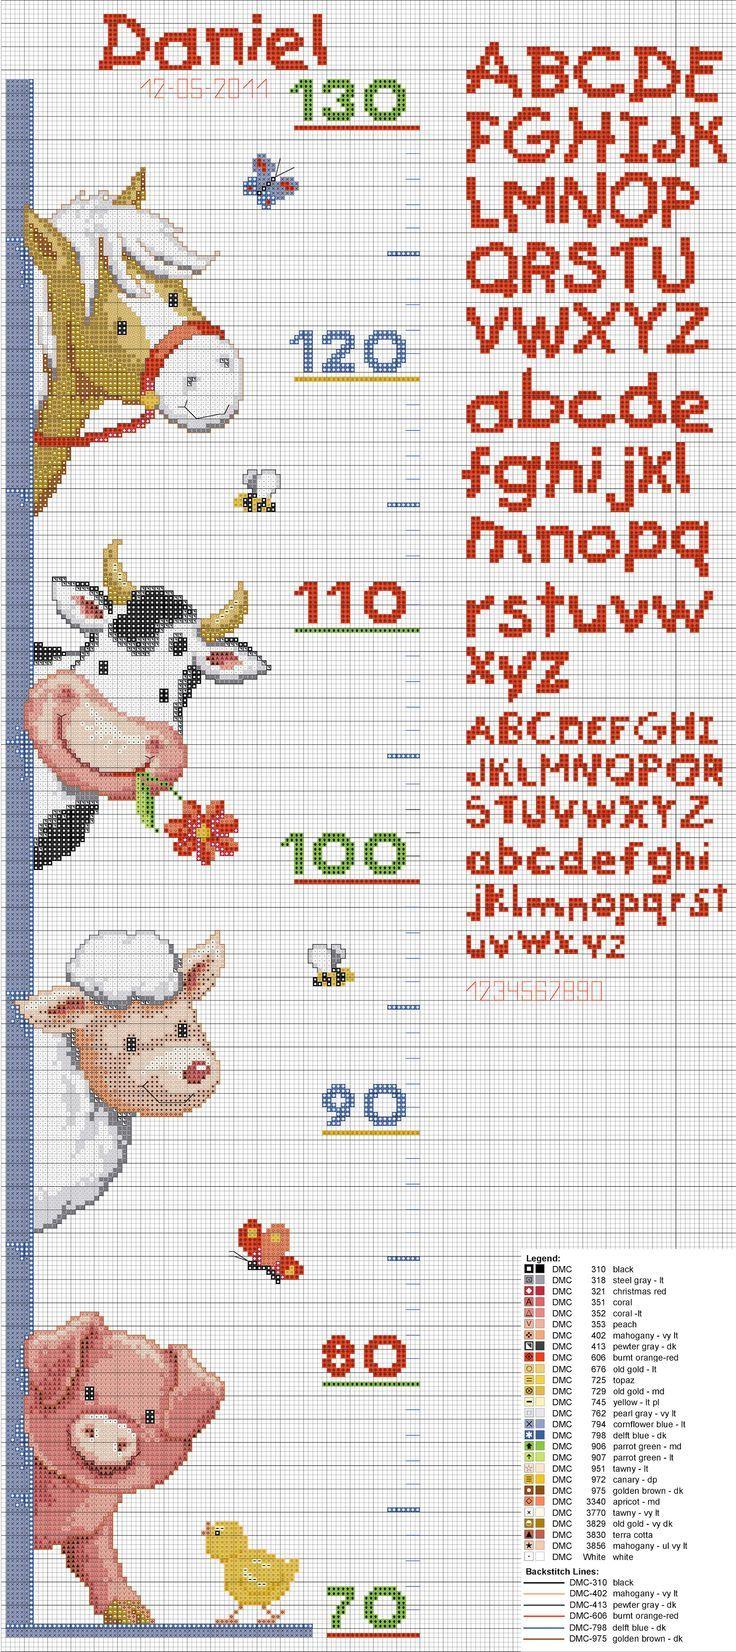 1d233dc8fb6a0cba135f3ef4a6dfac1bg 7361652 Letras Pinterest